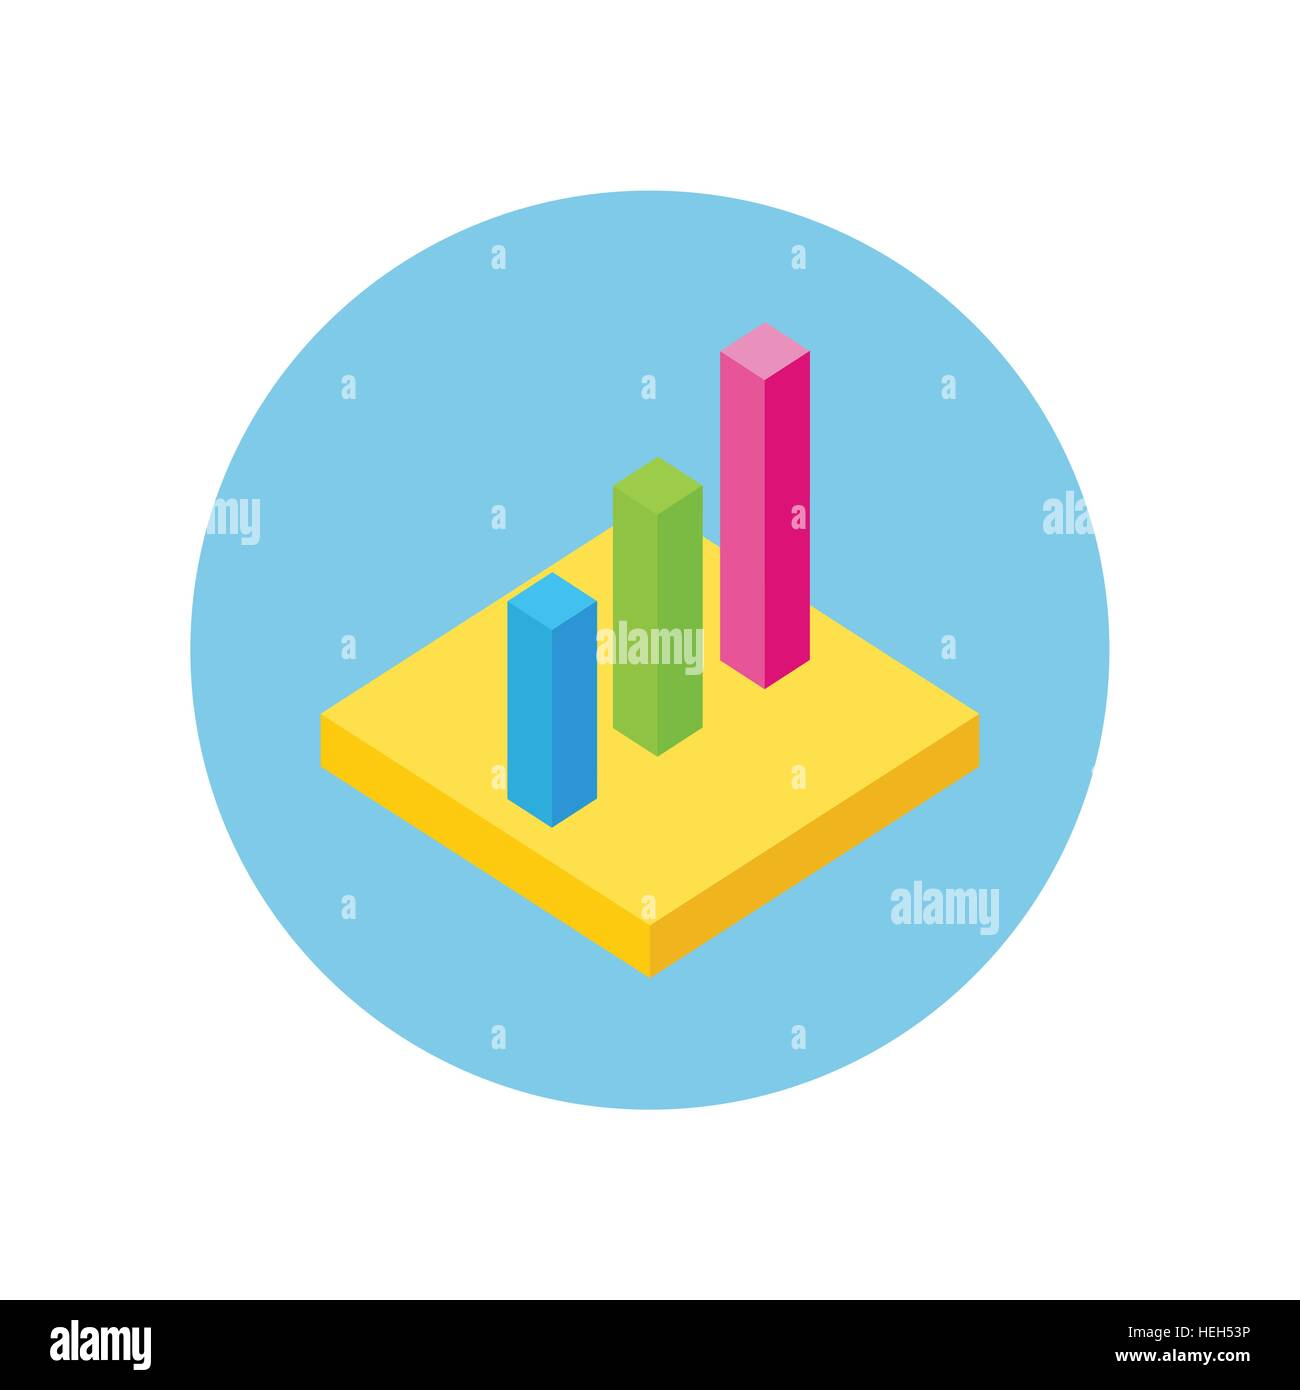 Isometric 3d analysis data isometric pie chart flat design graph isometric pie chart flat design graph pie infographics and pie chart diagram marketing report nvjuhfo Choice Image